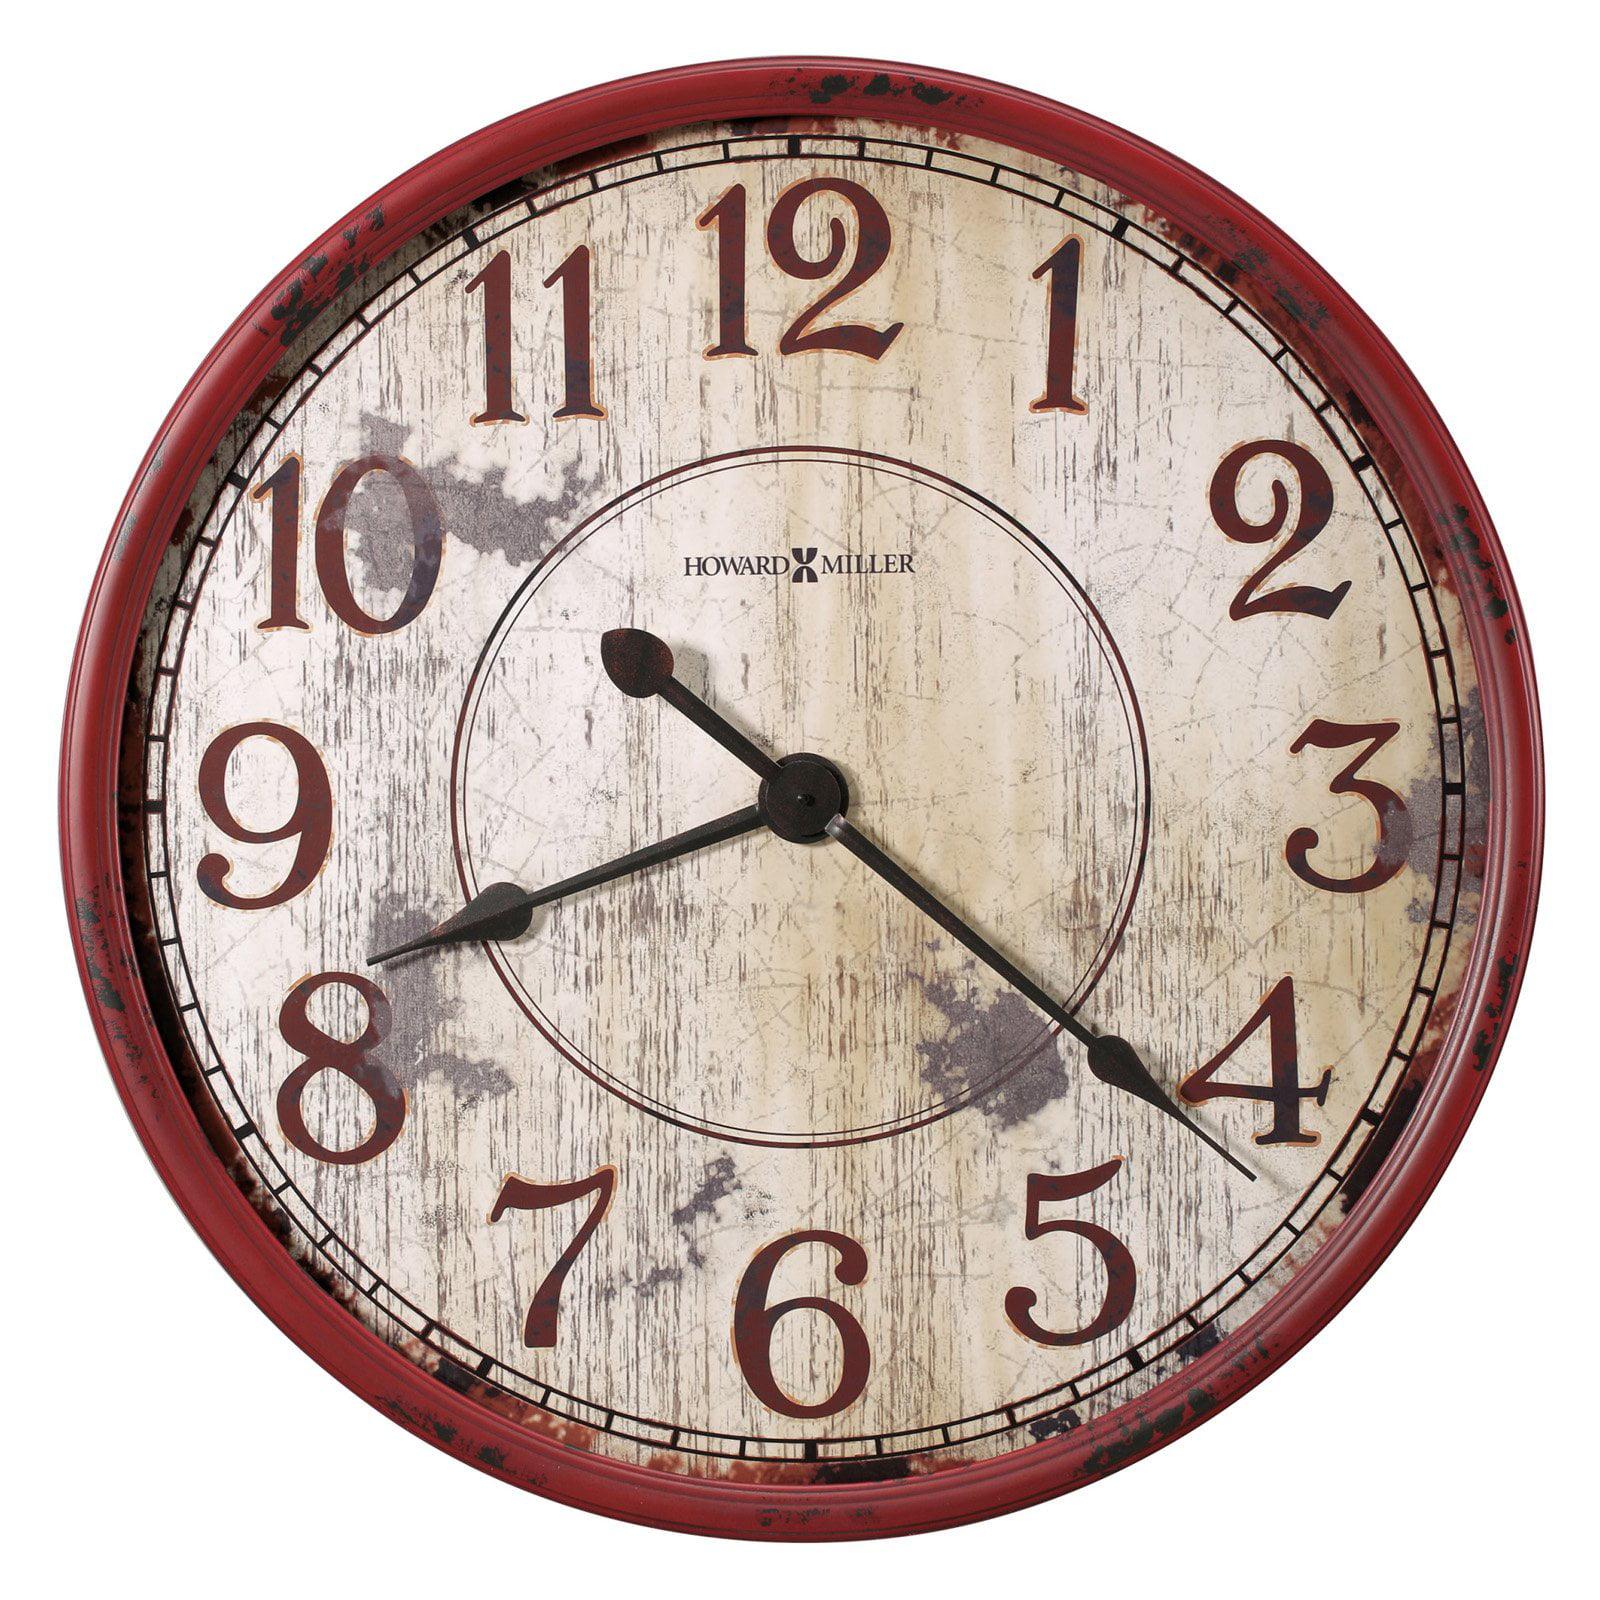 Howard Miller 32 in. Back 40 Wall Clock by Howard Miller